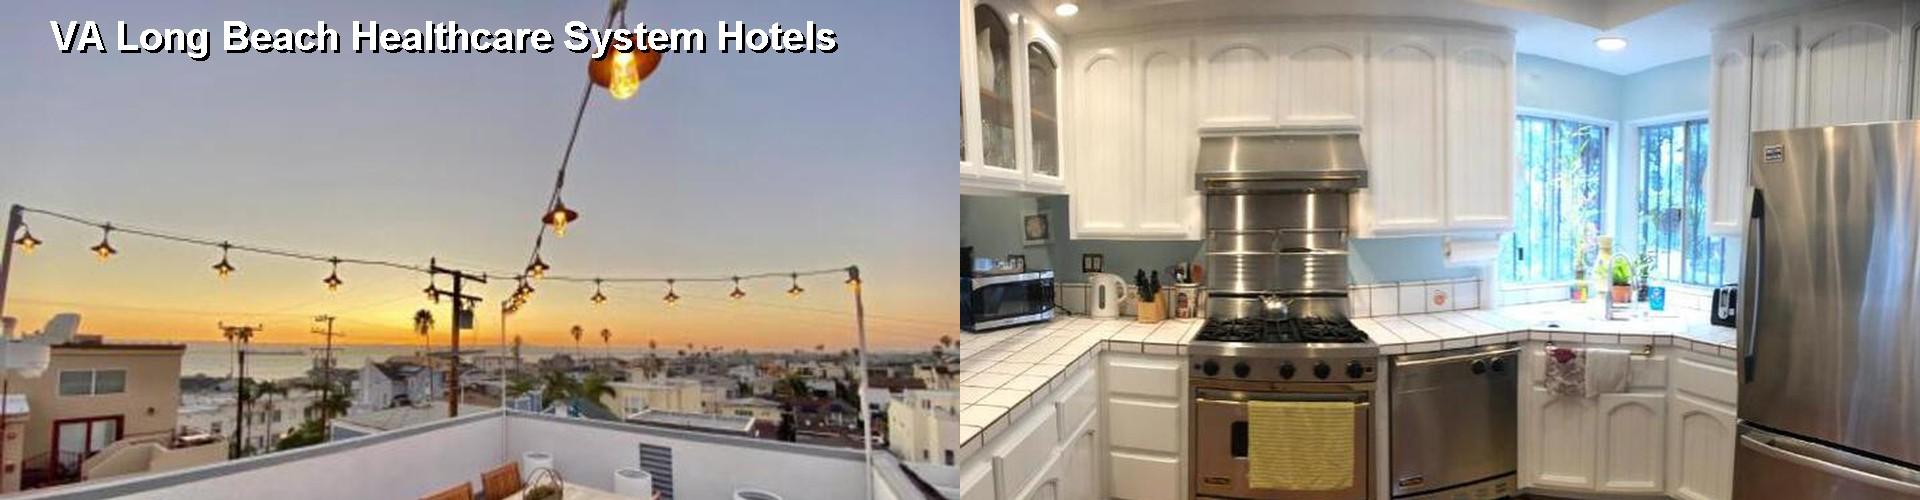 5 Best Hotels Near Va Long Beach Healthcare System